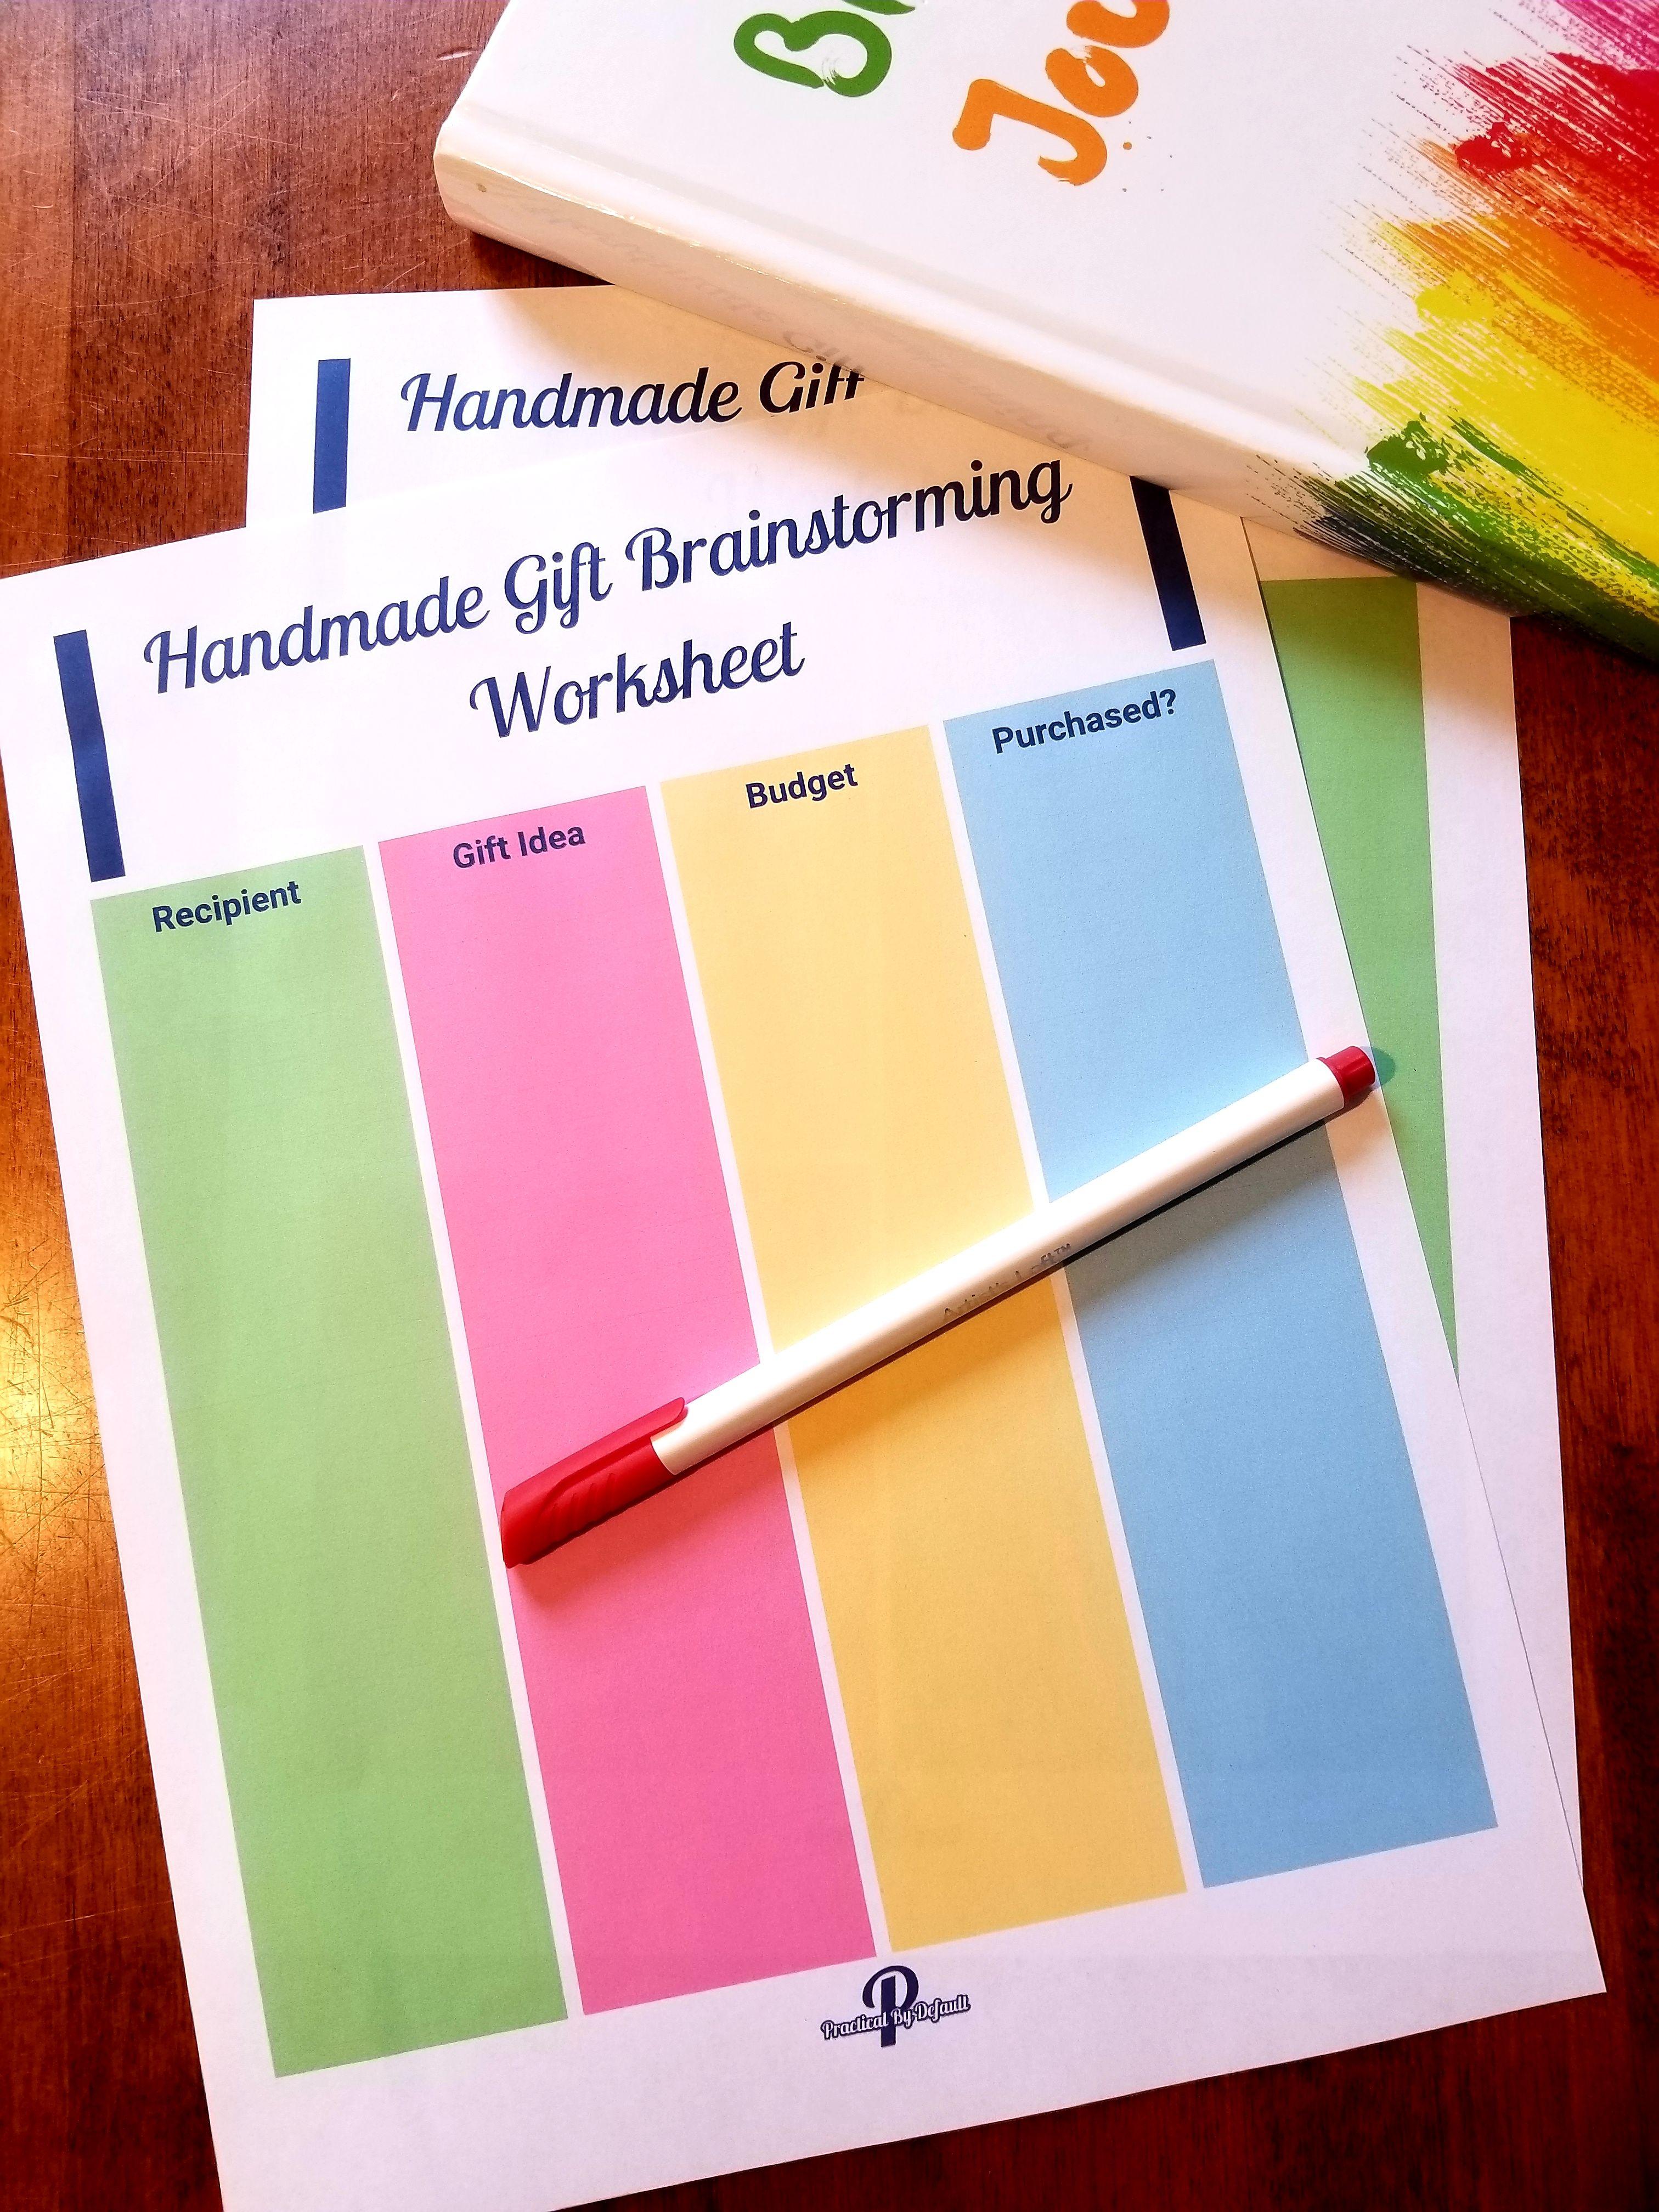 Grab These Free Brainstorming Worksheet To Help You Plan